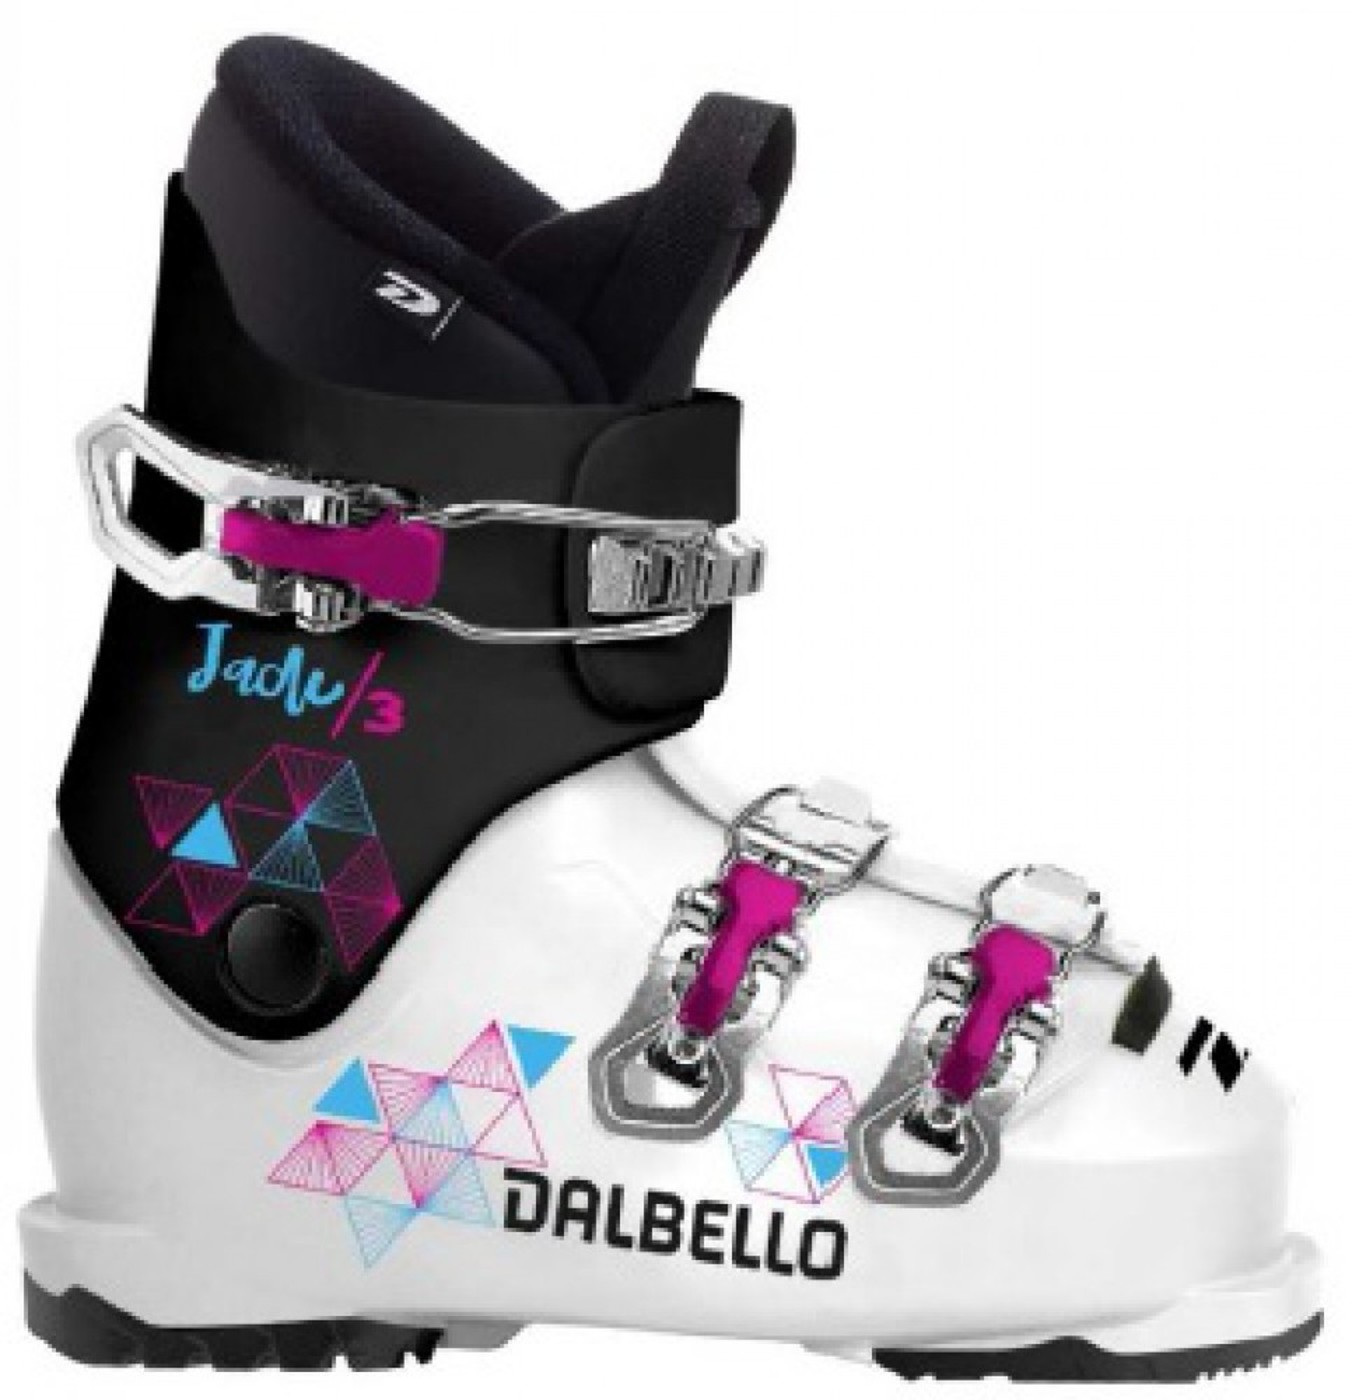 DALBELLO JADE 3.0 - Kinder